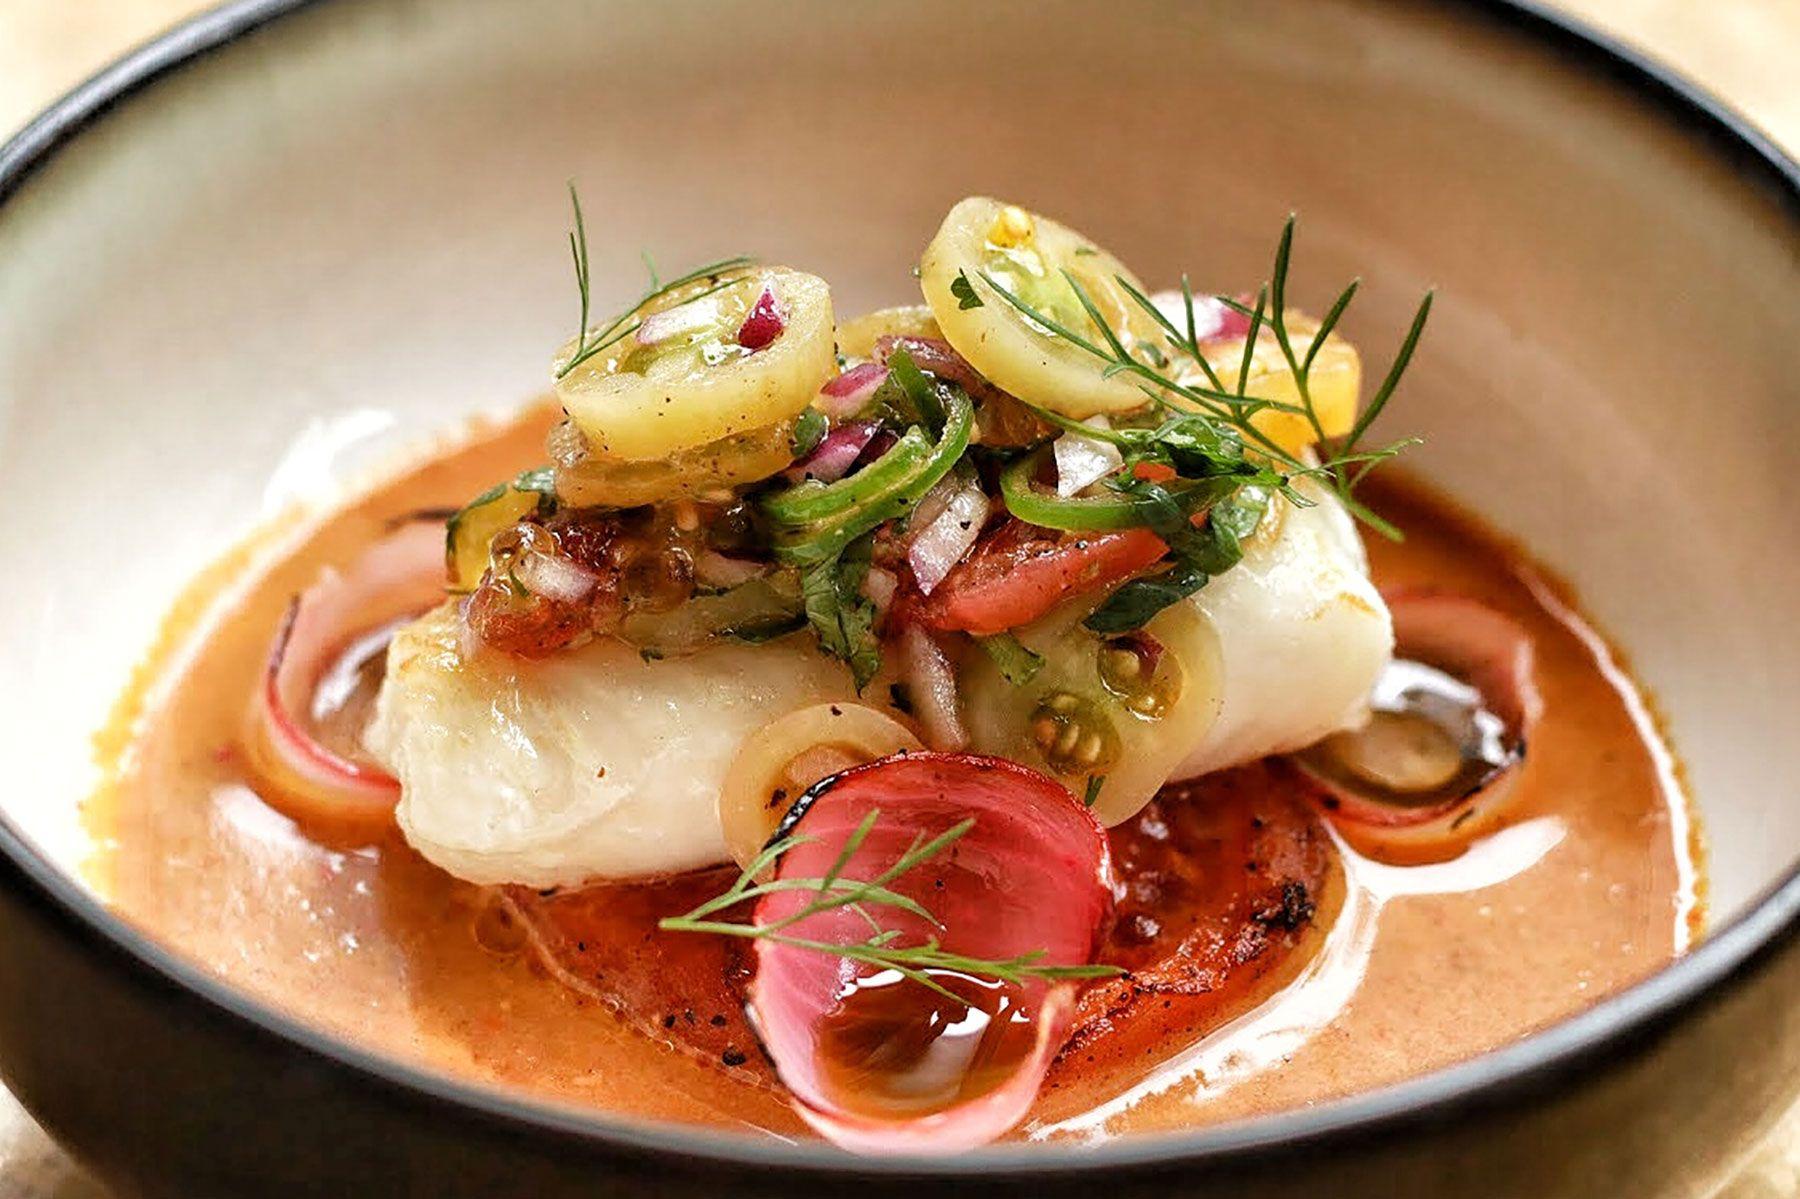 Where To Eat This Week: Ding Dong, 25 Degrees, Ola Cocina Del Mar, Tono Cevicheria, La Brasserie, Publico Ristorante